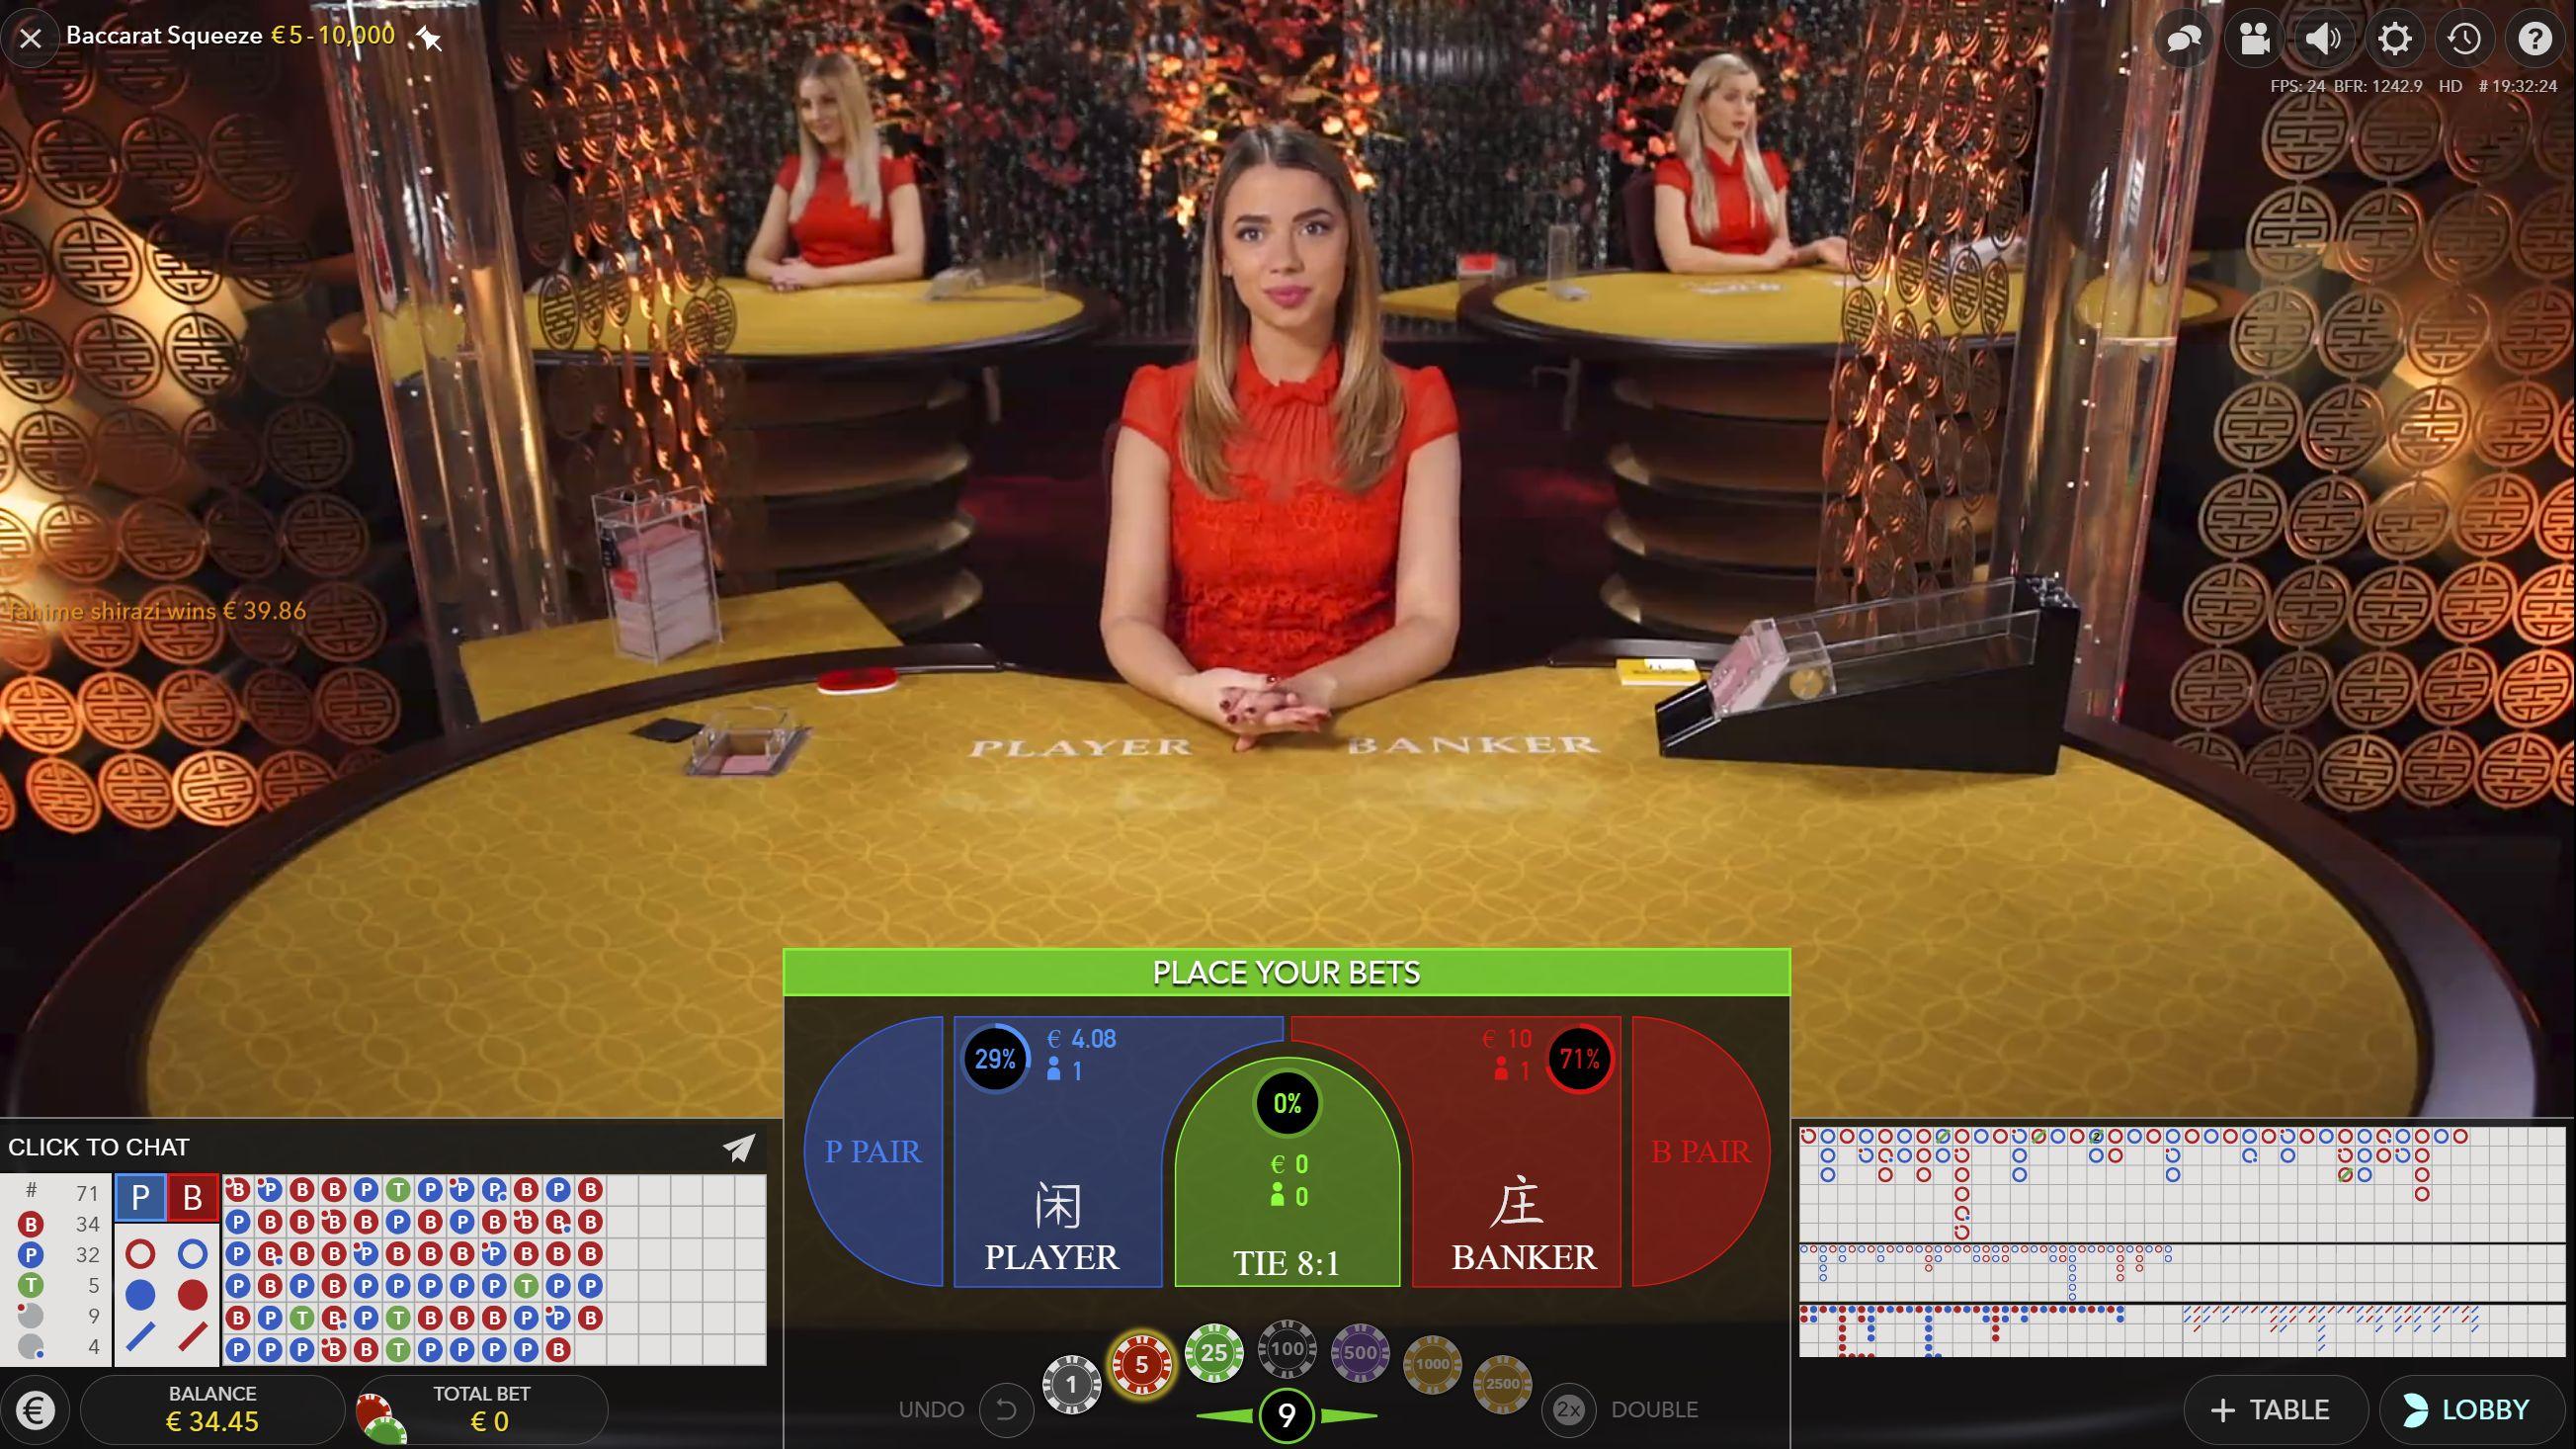 live dealer baccarat regeln online casino kartenspiel strategie kasino online